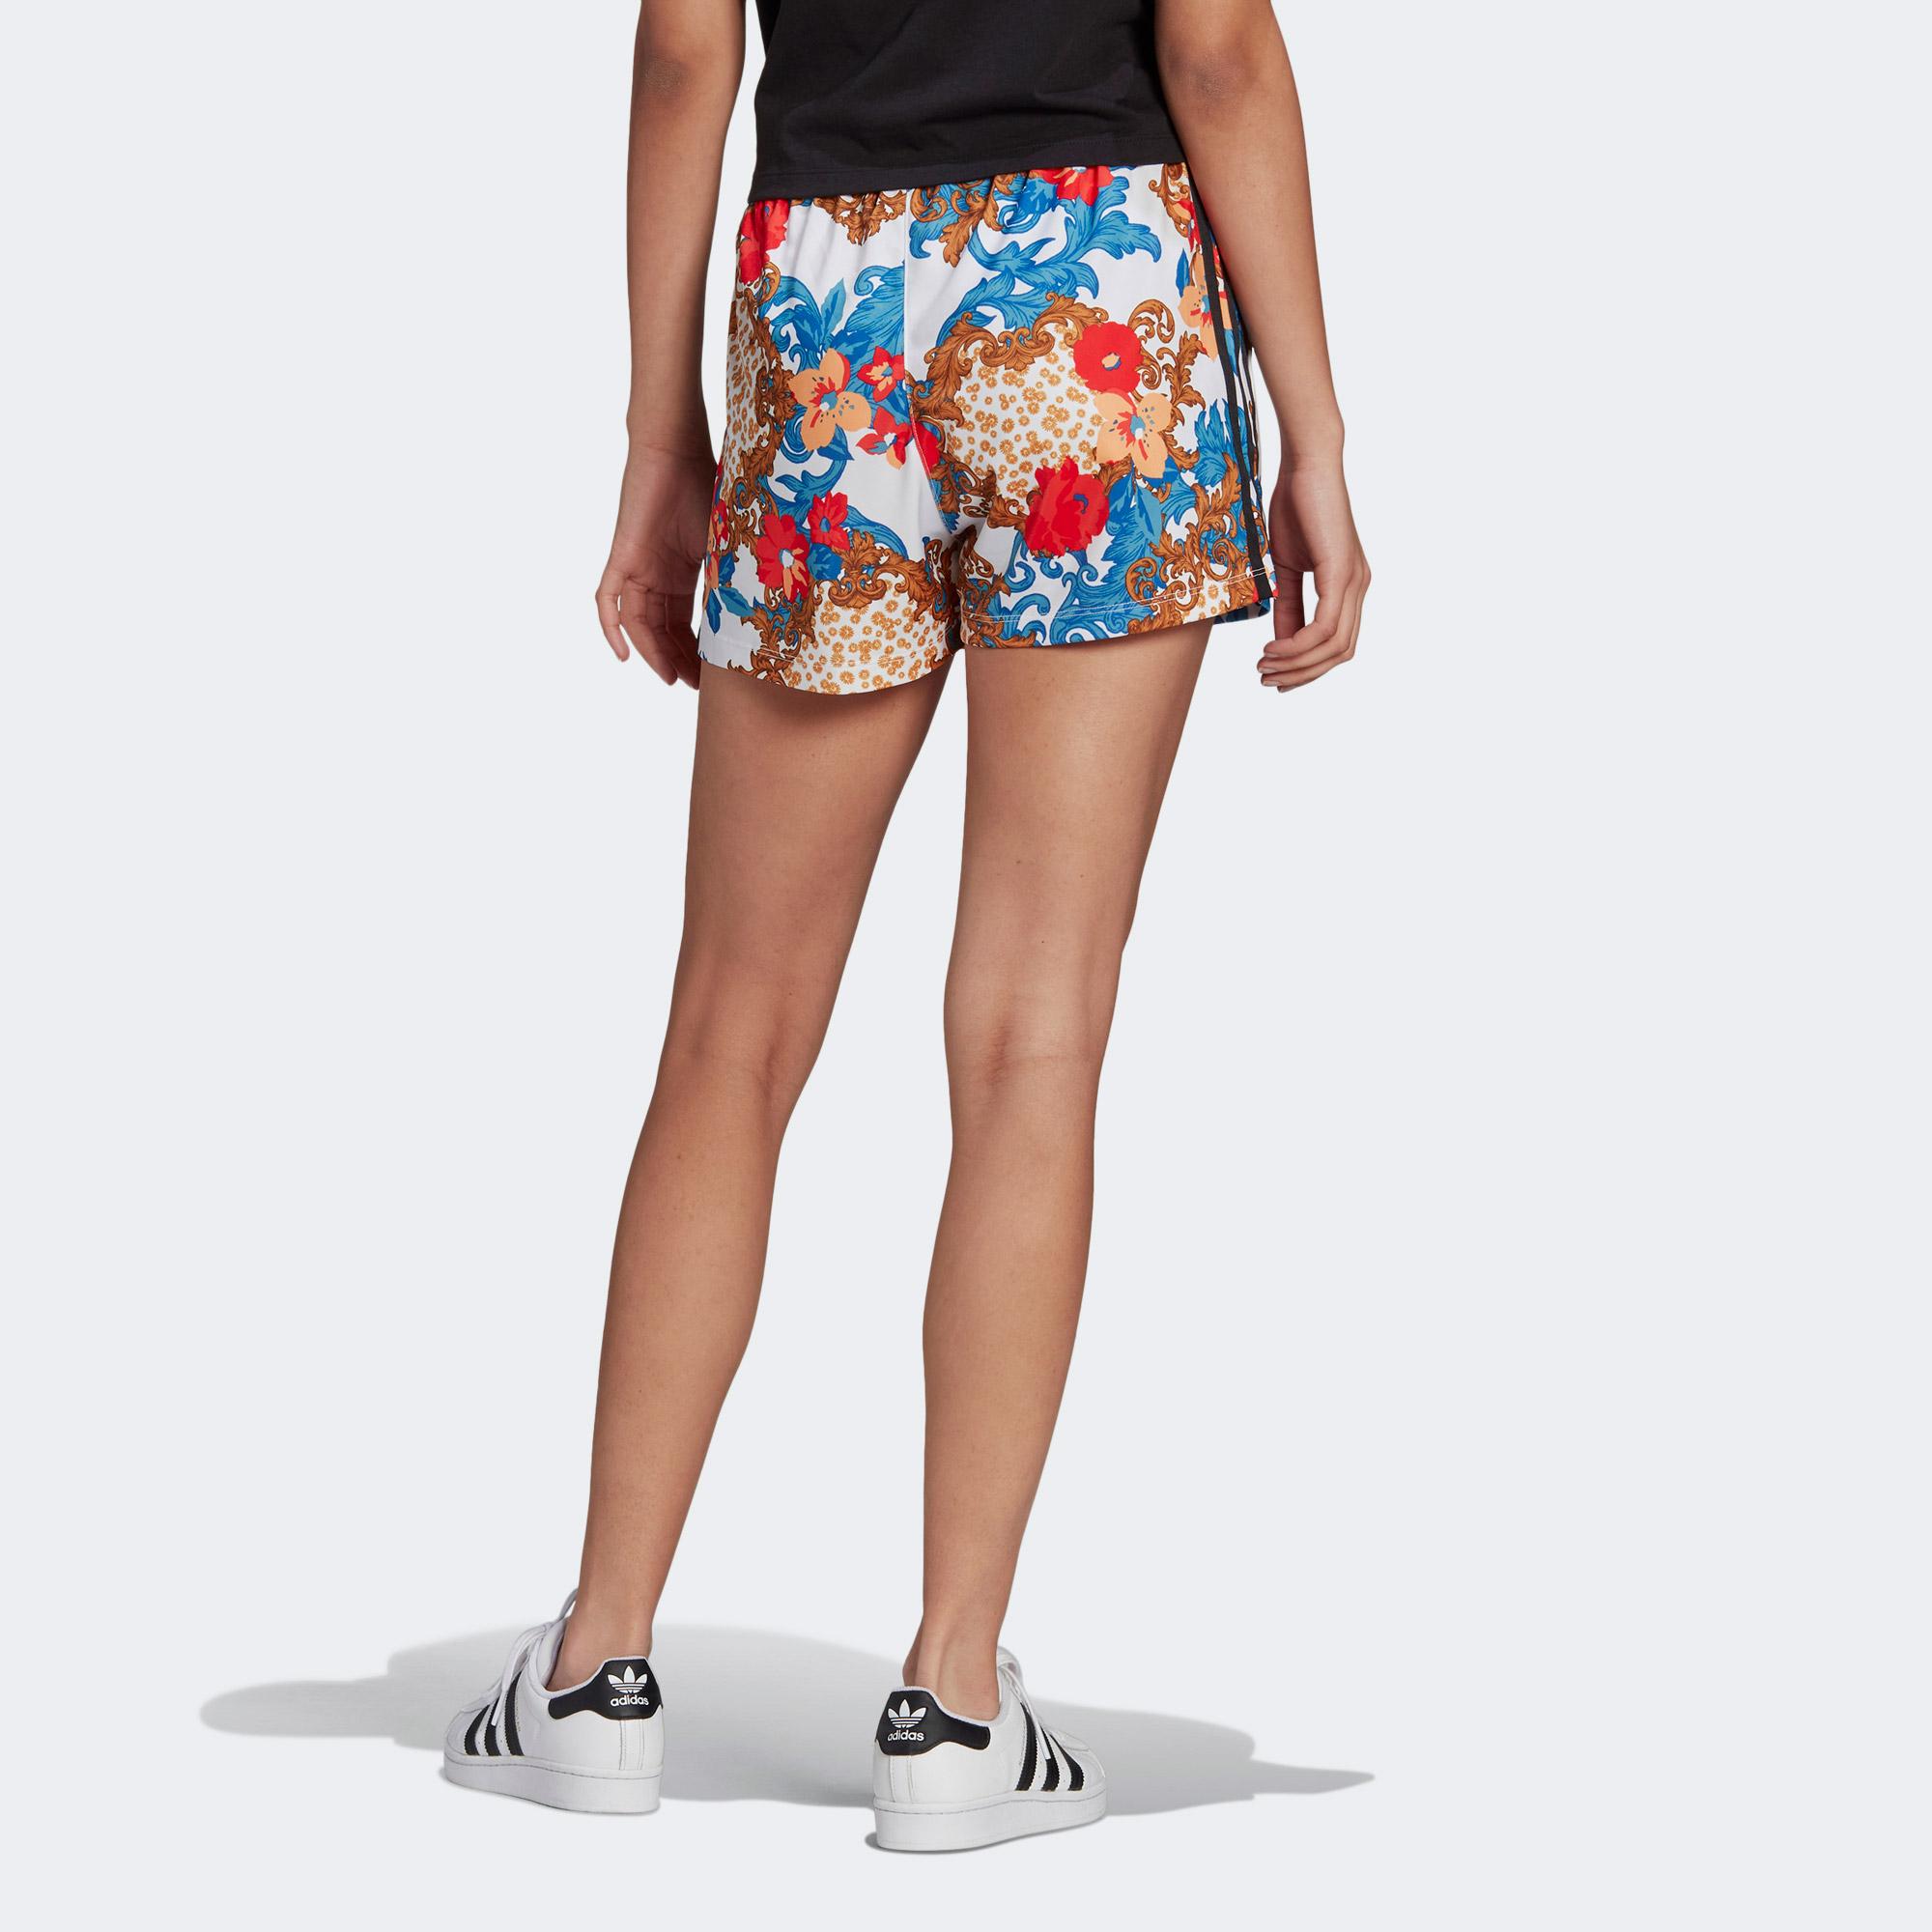 adidas HER Studio London Kadın Renkli Şort